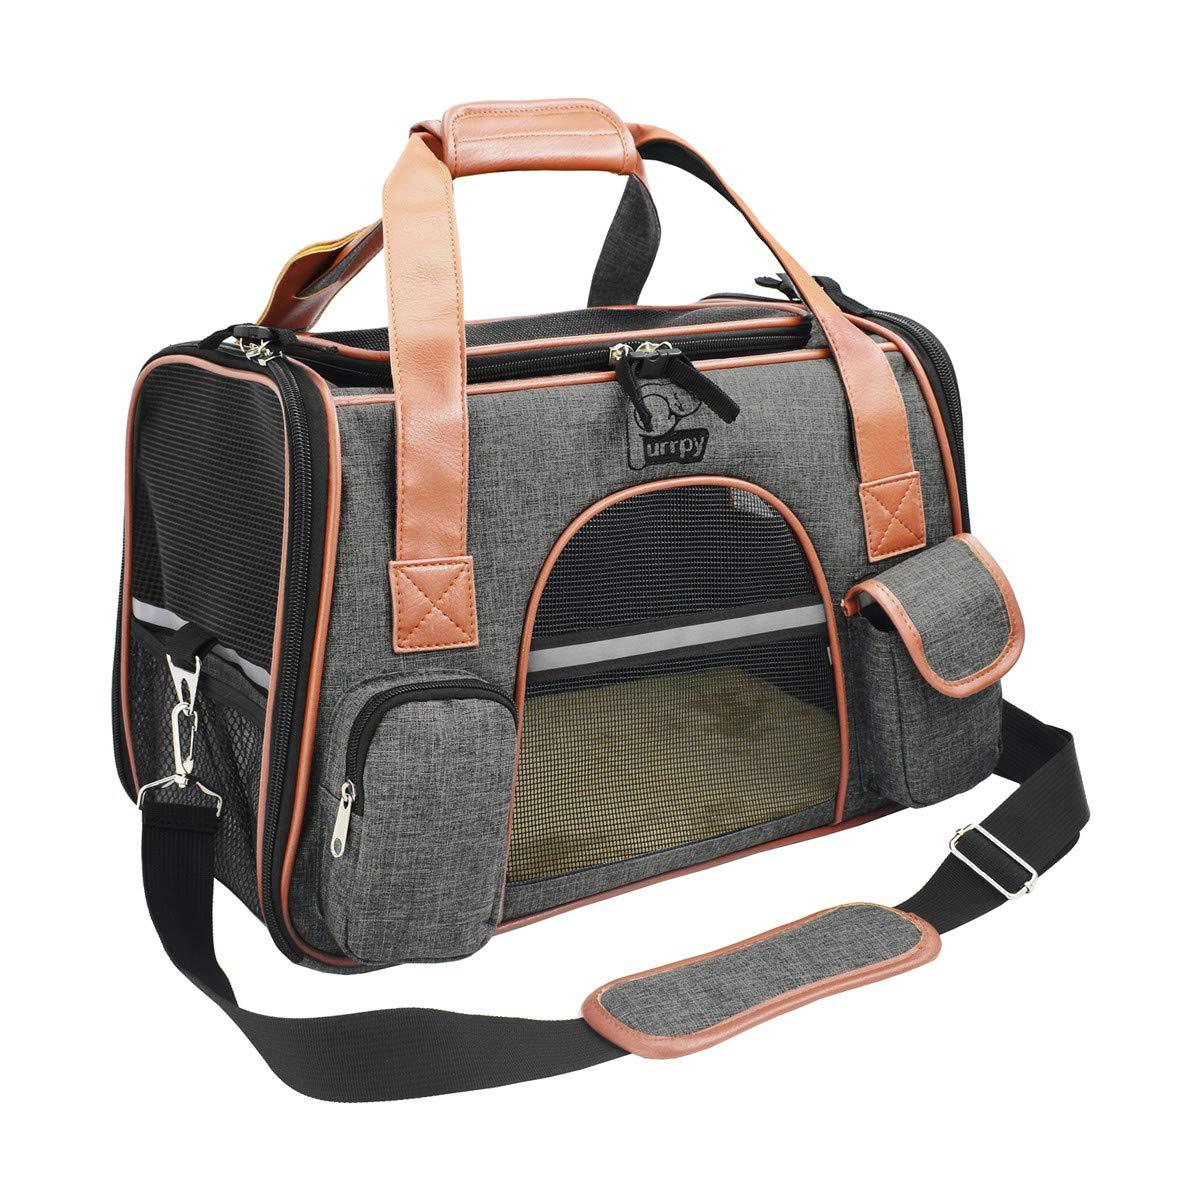 Purrpy Premium Cat Dog Carrier Airline Approved Soft Sided Pet Travel Bag, Car Seat Safe Carrier Deep Grey